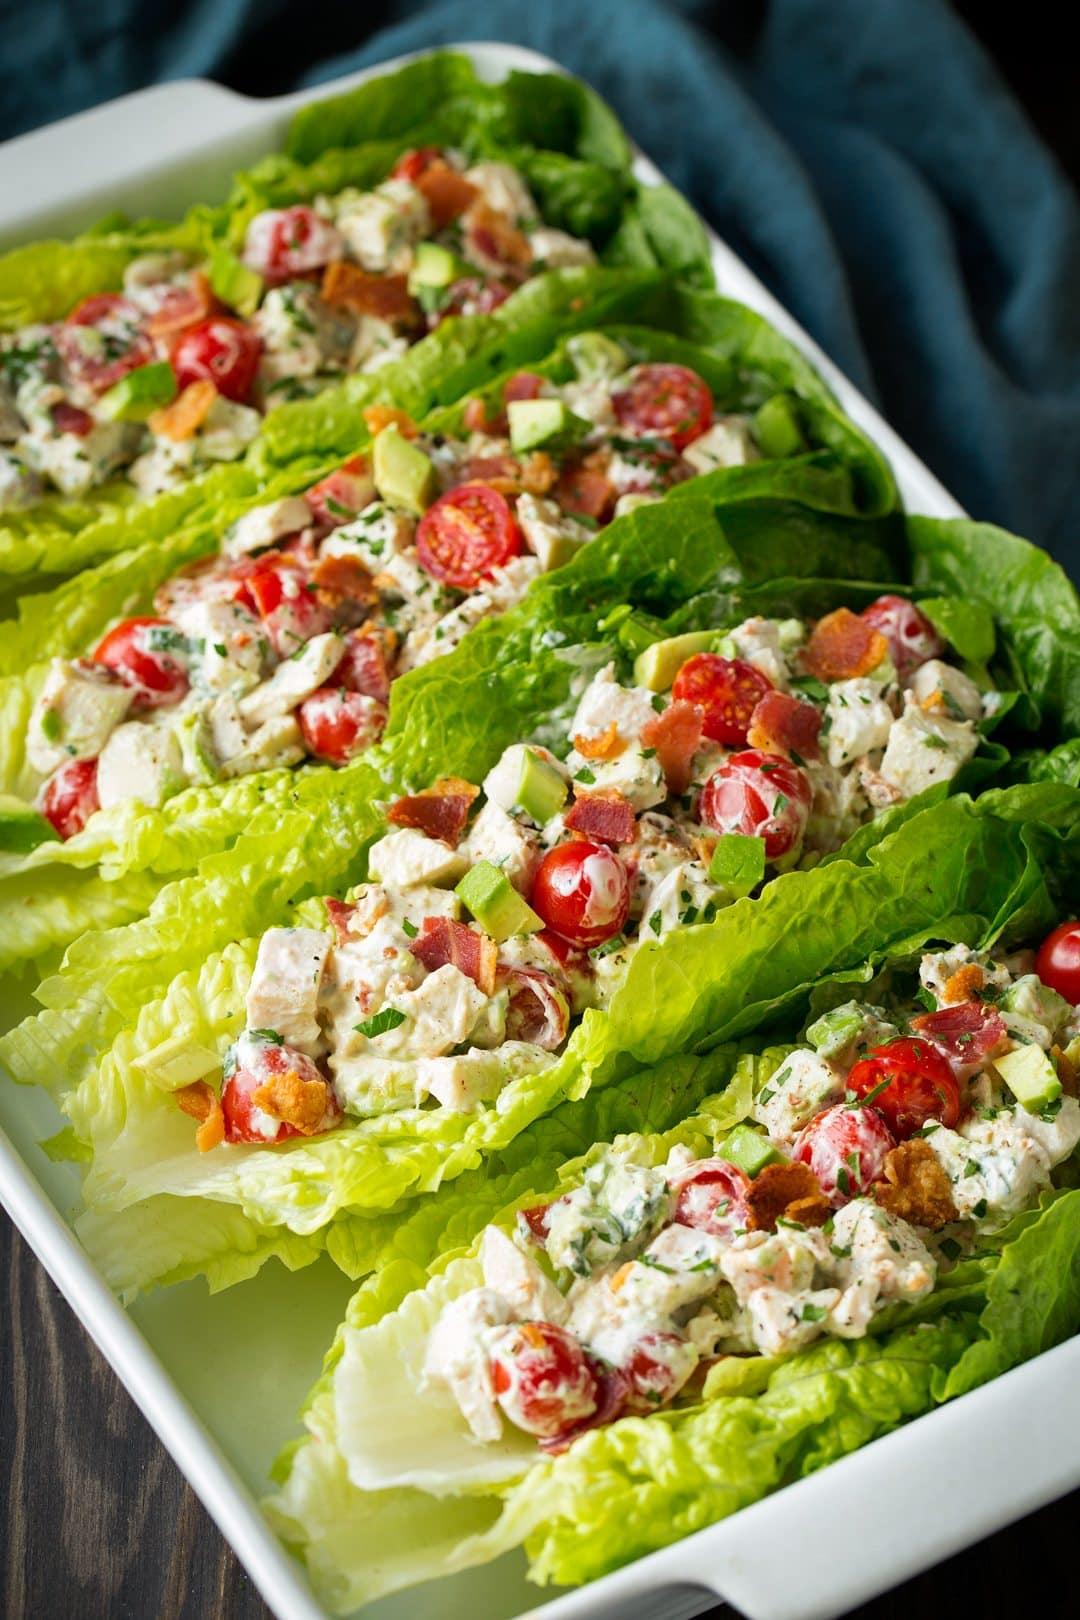 Blta Chicken Salad Lettuce Wraps Cooking Classy